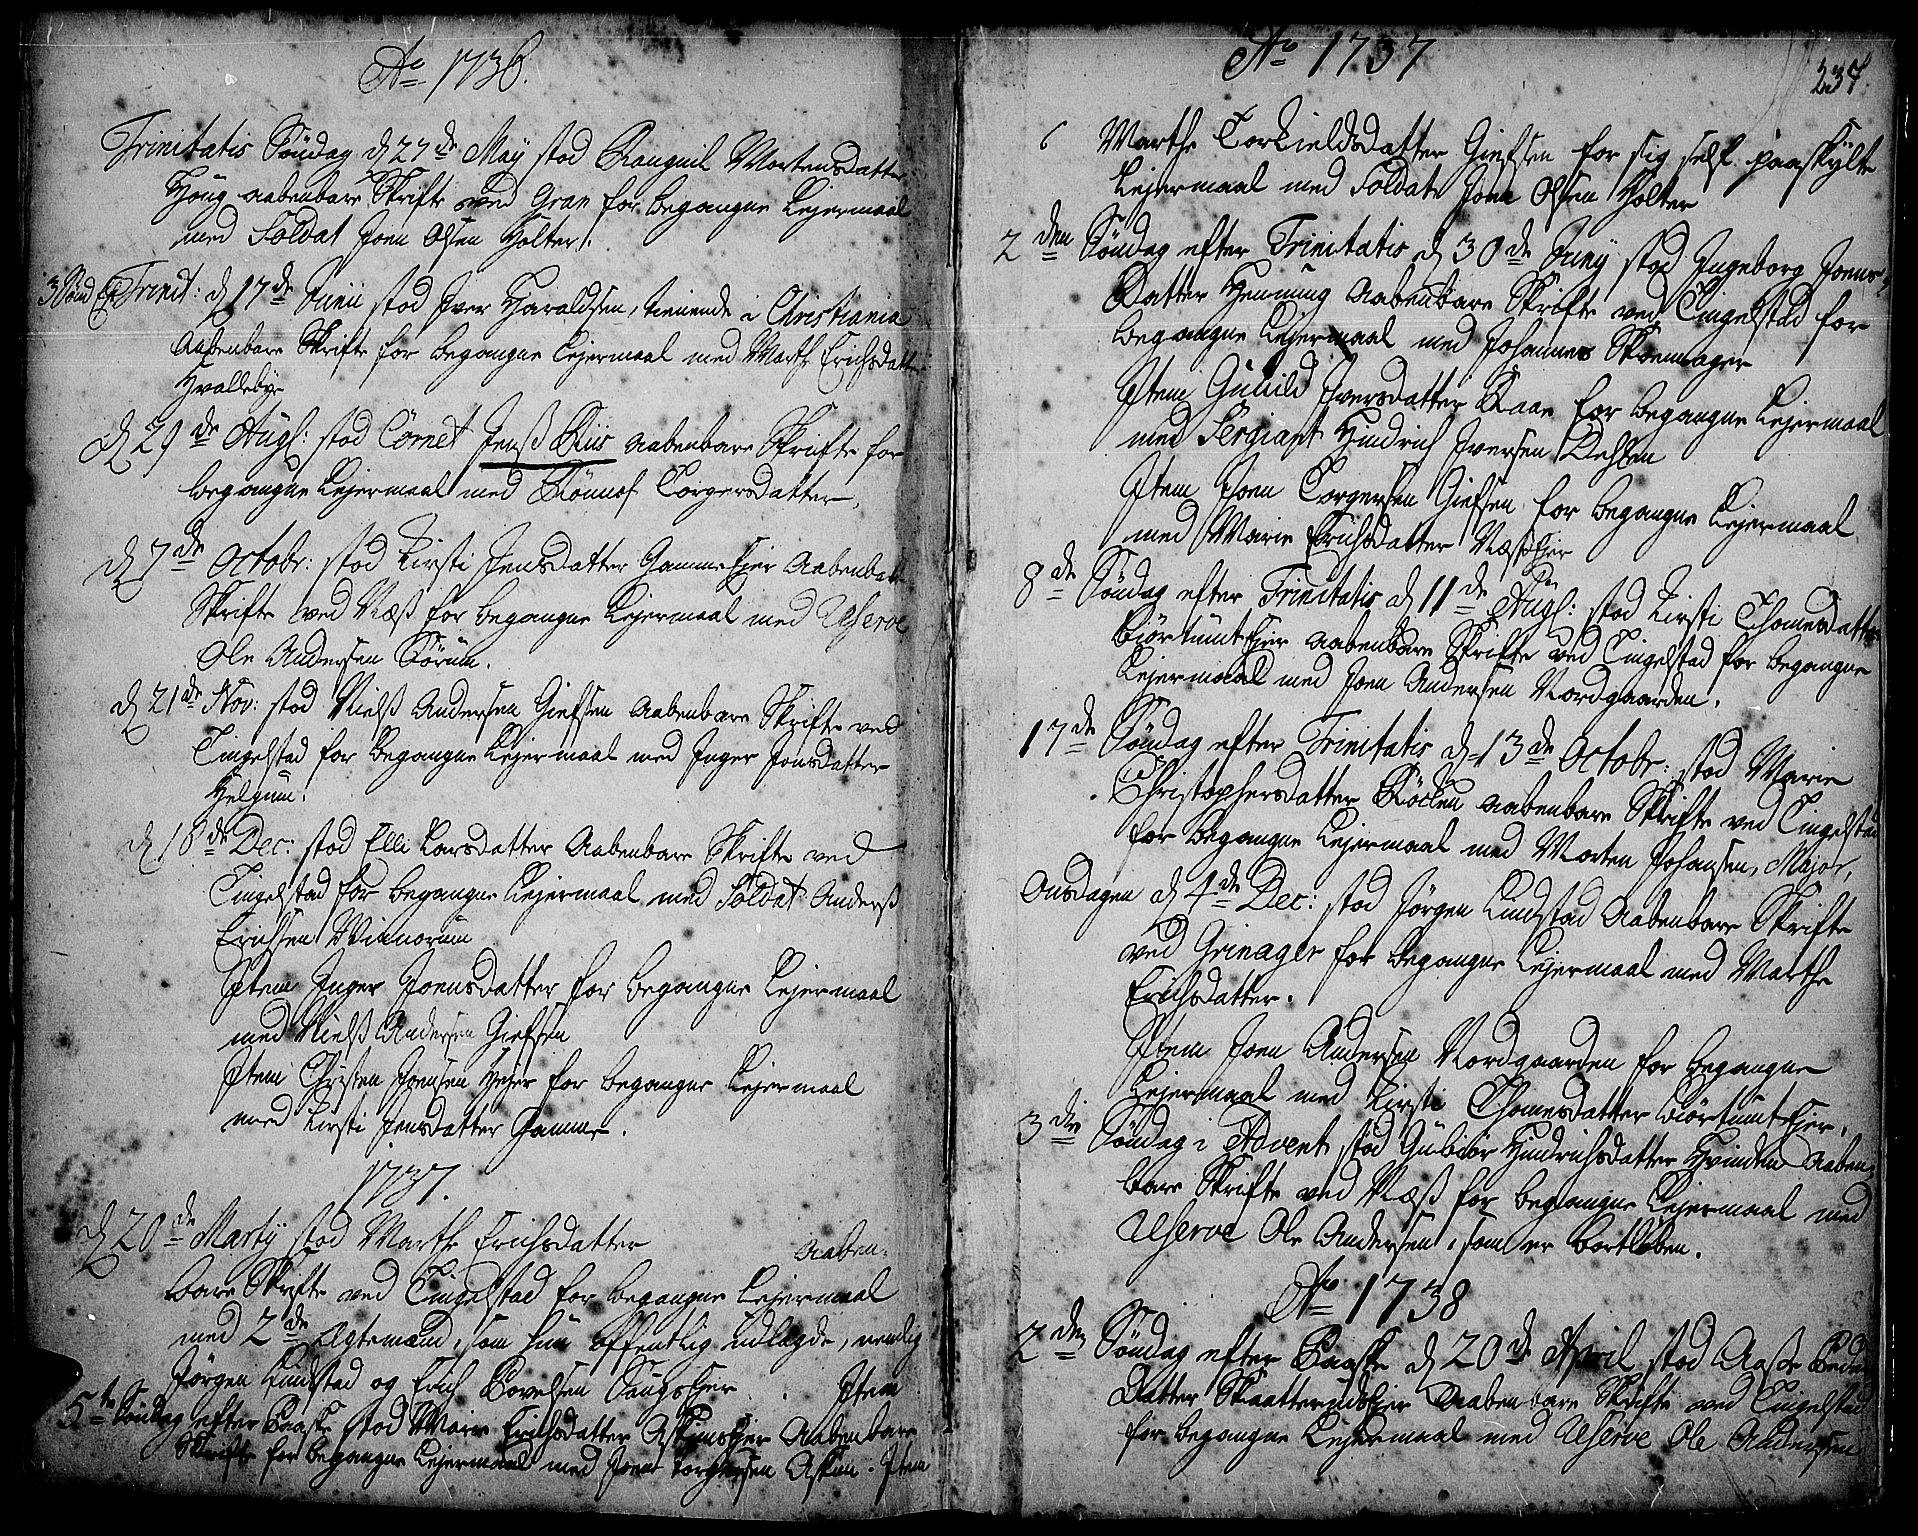 SAH, Gran prestekontor, Ministerialbok nr. 2, 1732-1744, s. 237